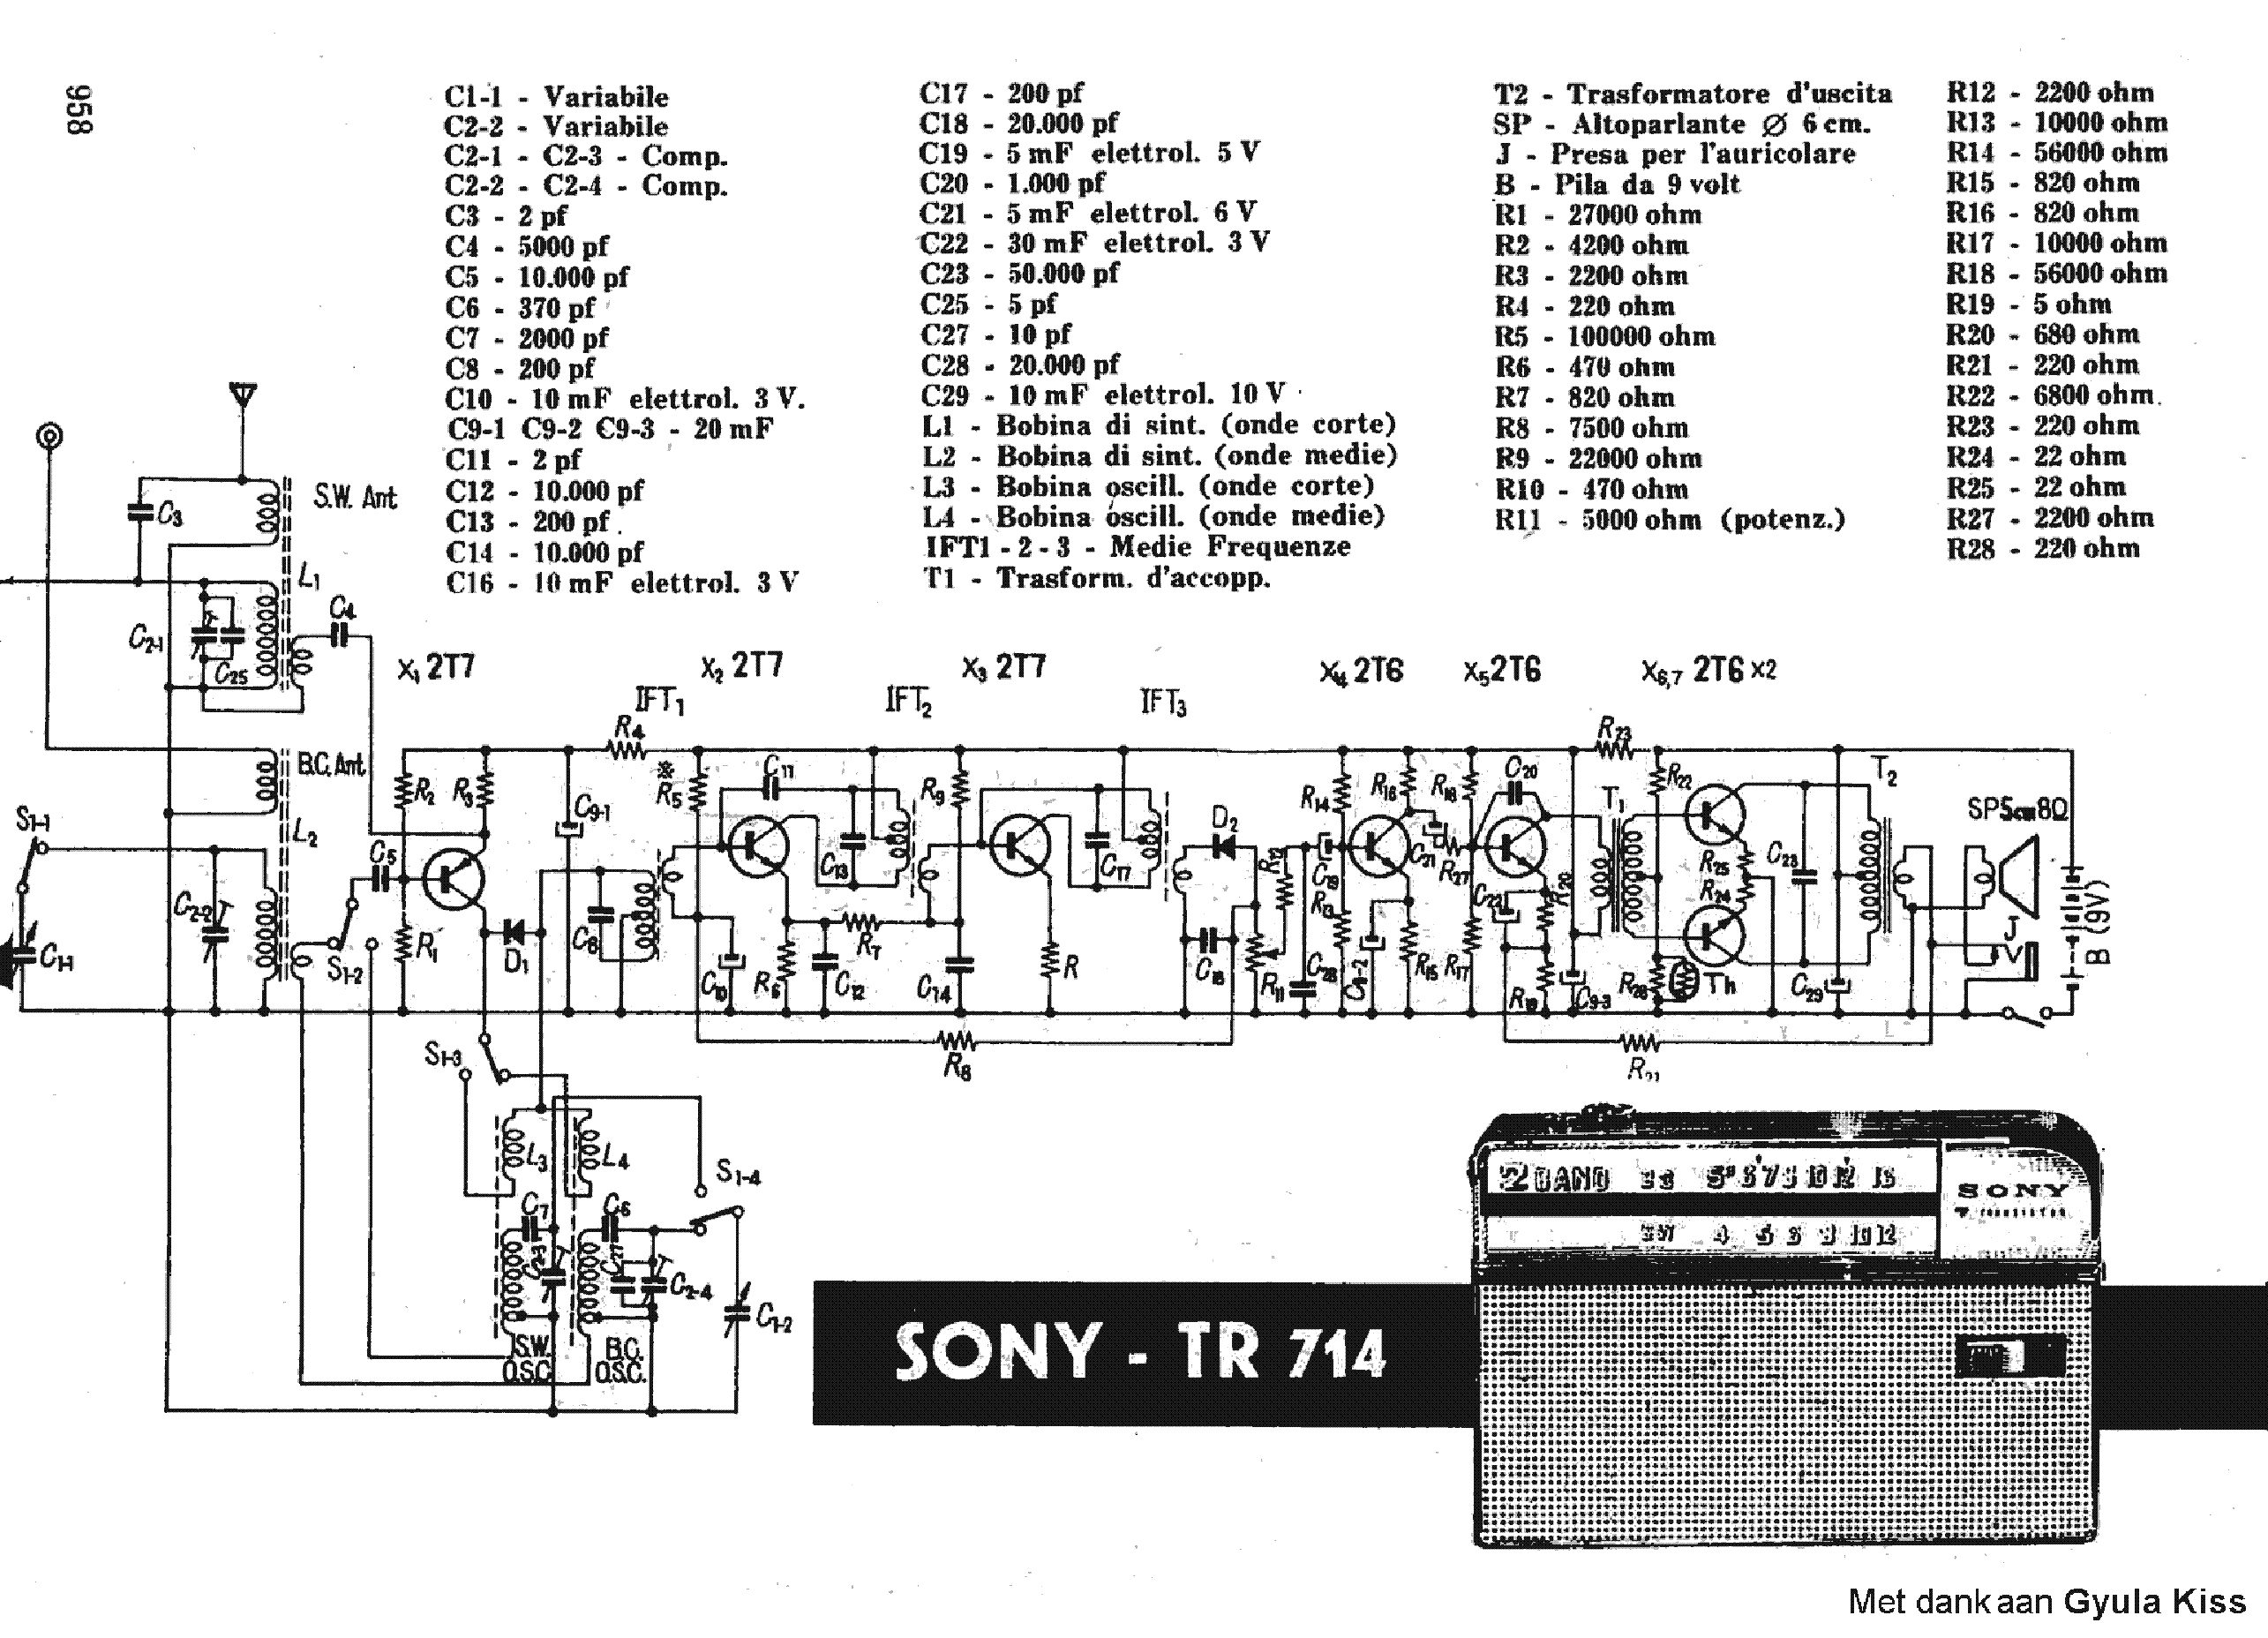 Sony Tr714 Transistor Pocket Radio Sch Service Manual